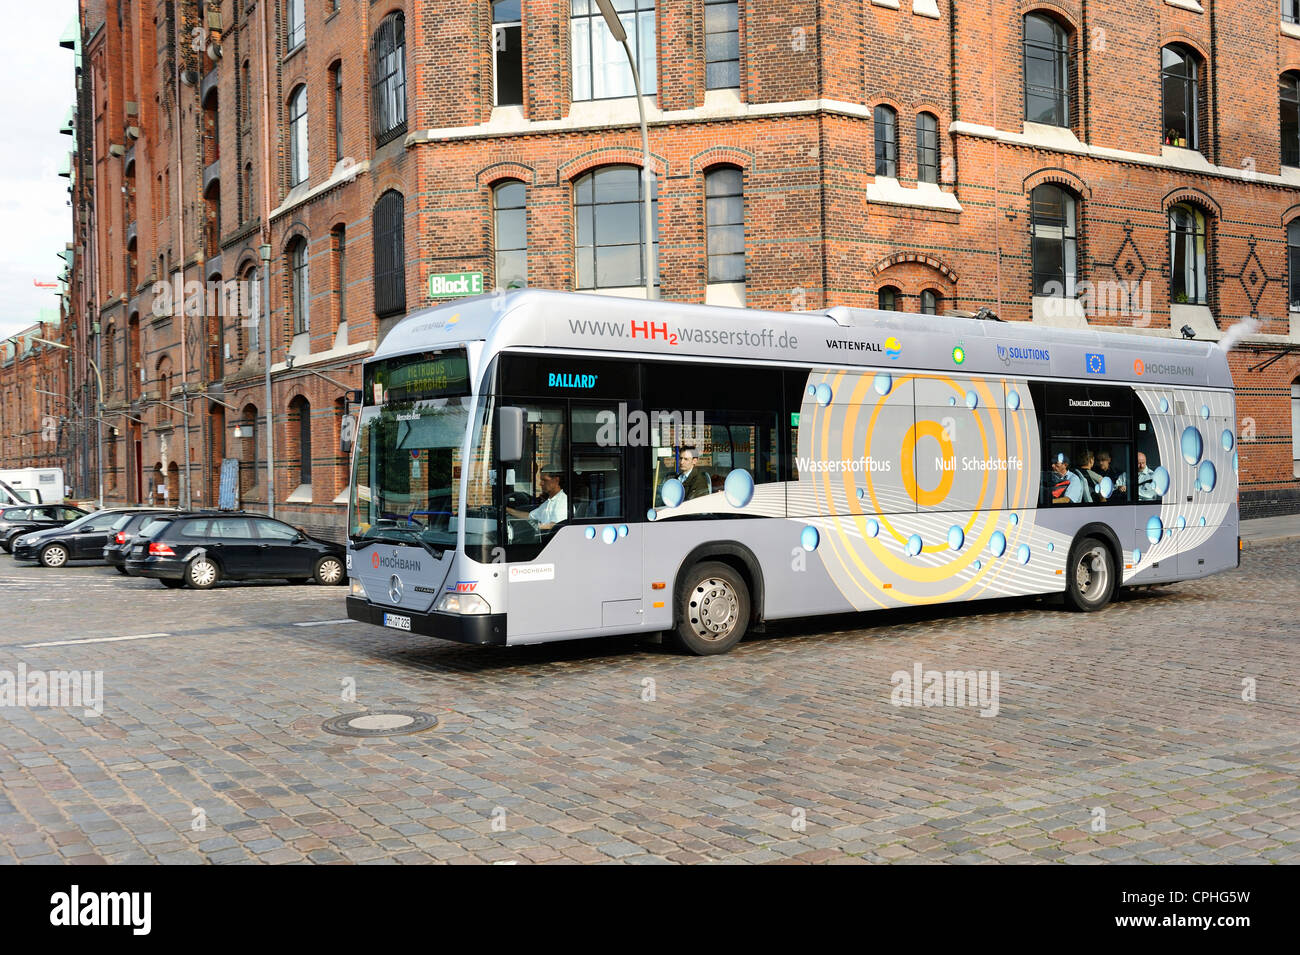 Hydrogen, fuel, propellant, bus, means of transportation, Hamburg, Germany, alternative, fuel, H, ., H2, 0, no, - Stock Image